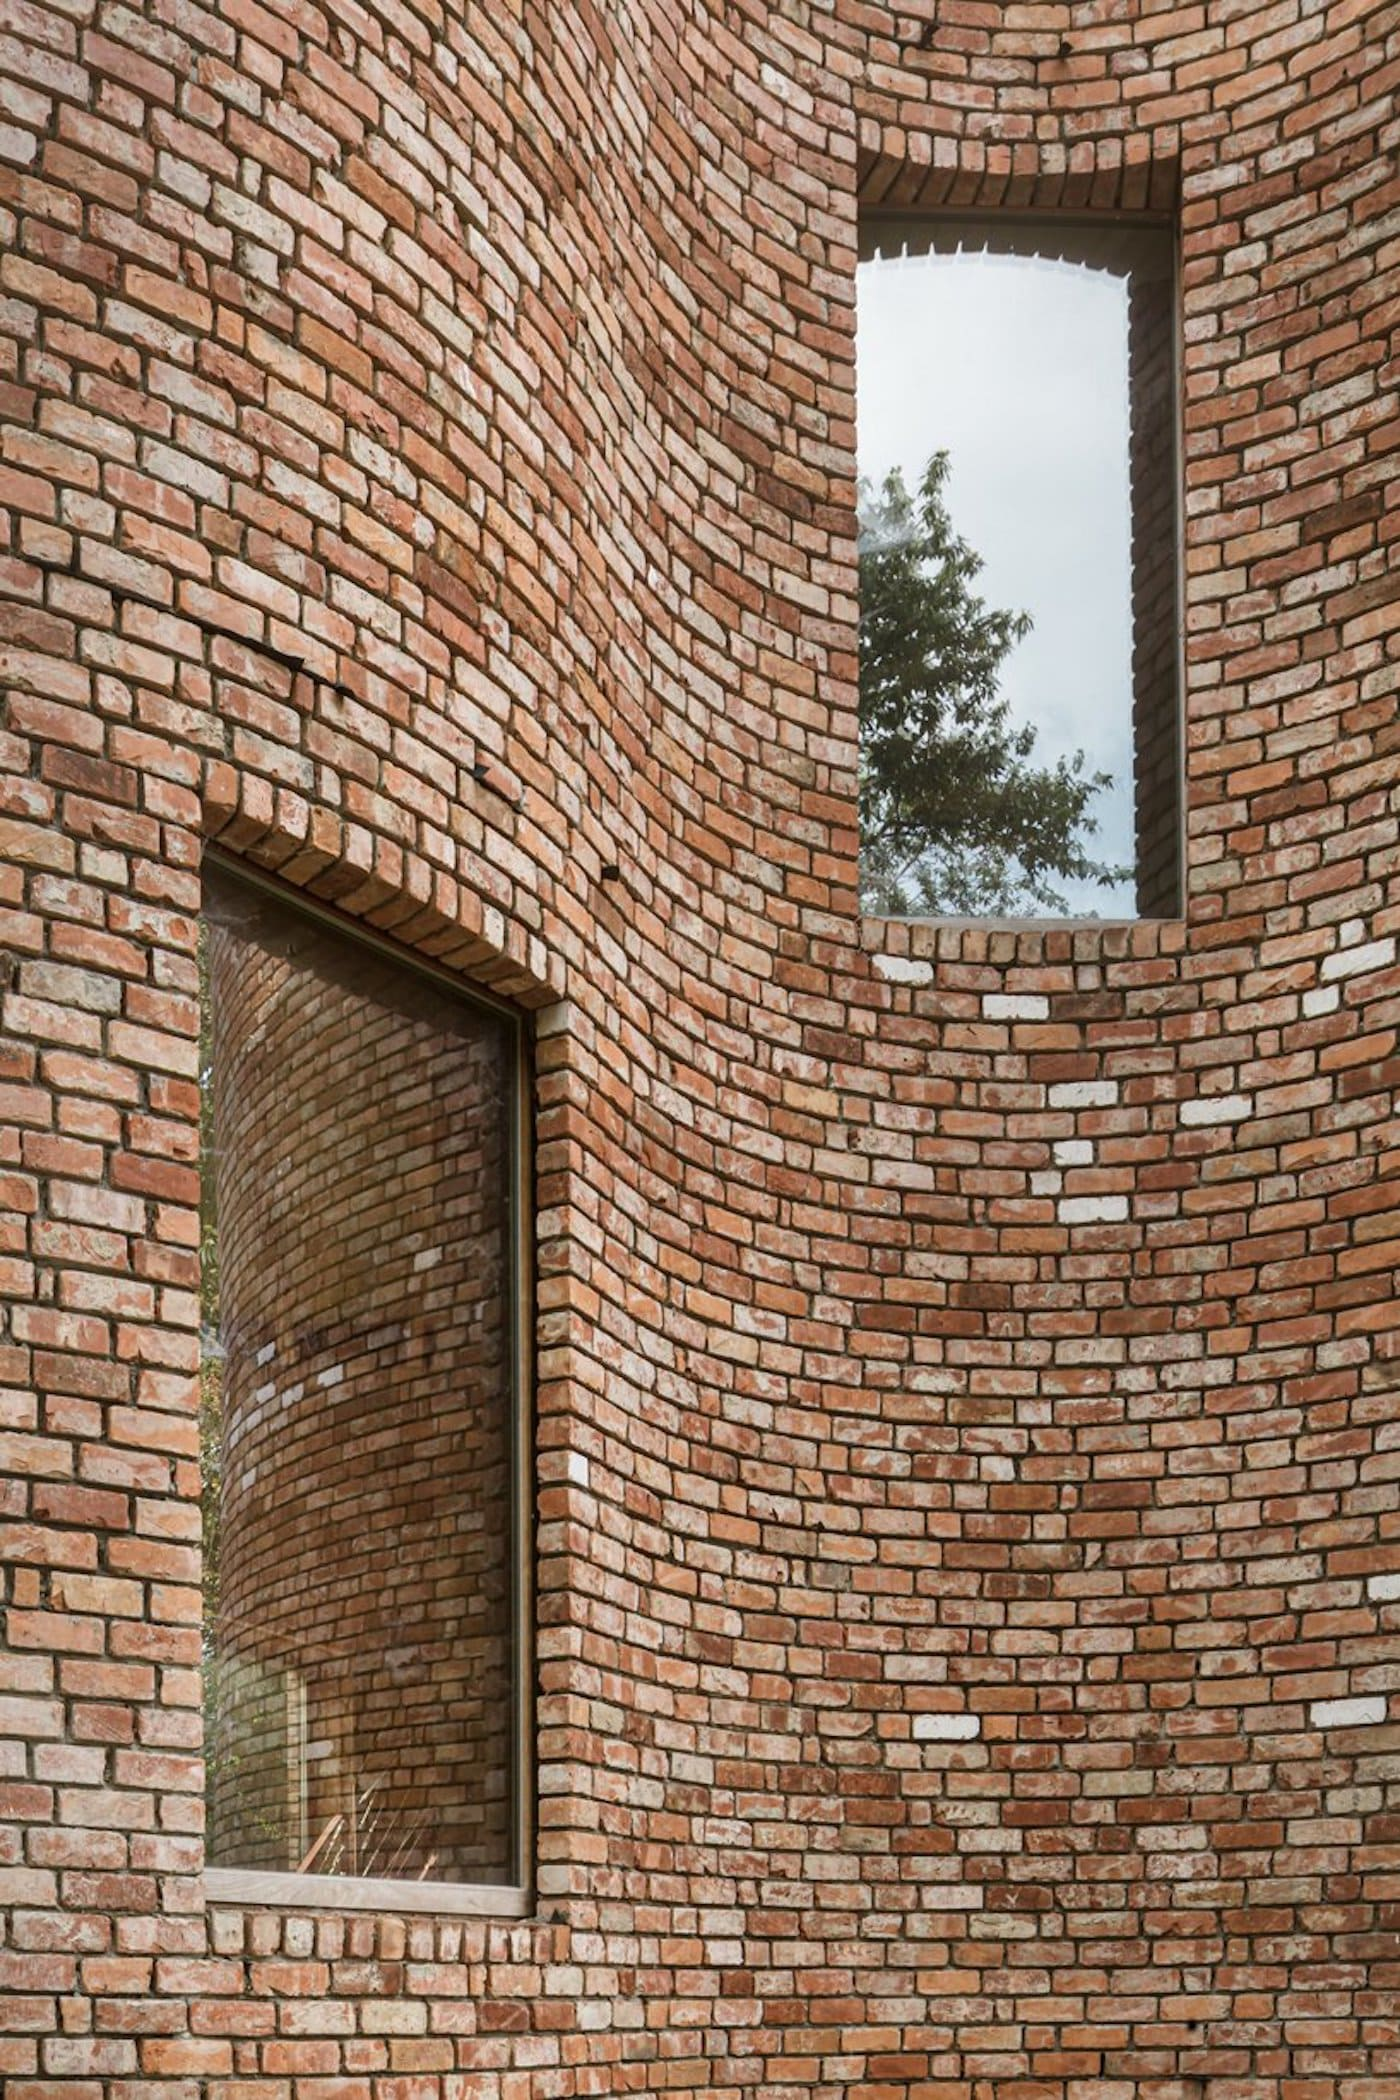 Close up of recycled bricks